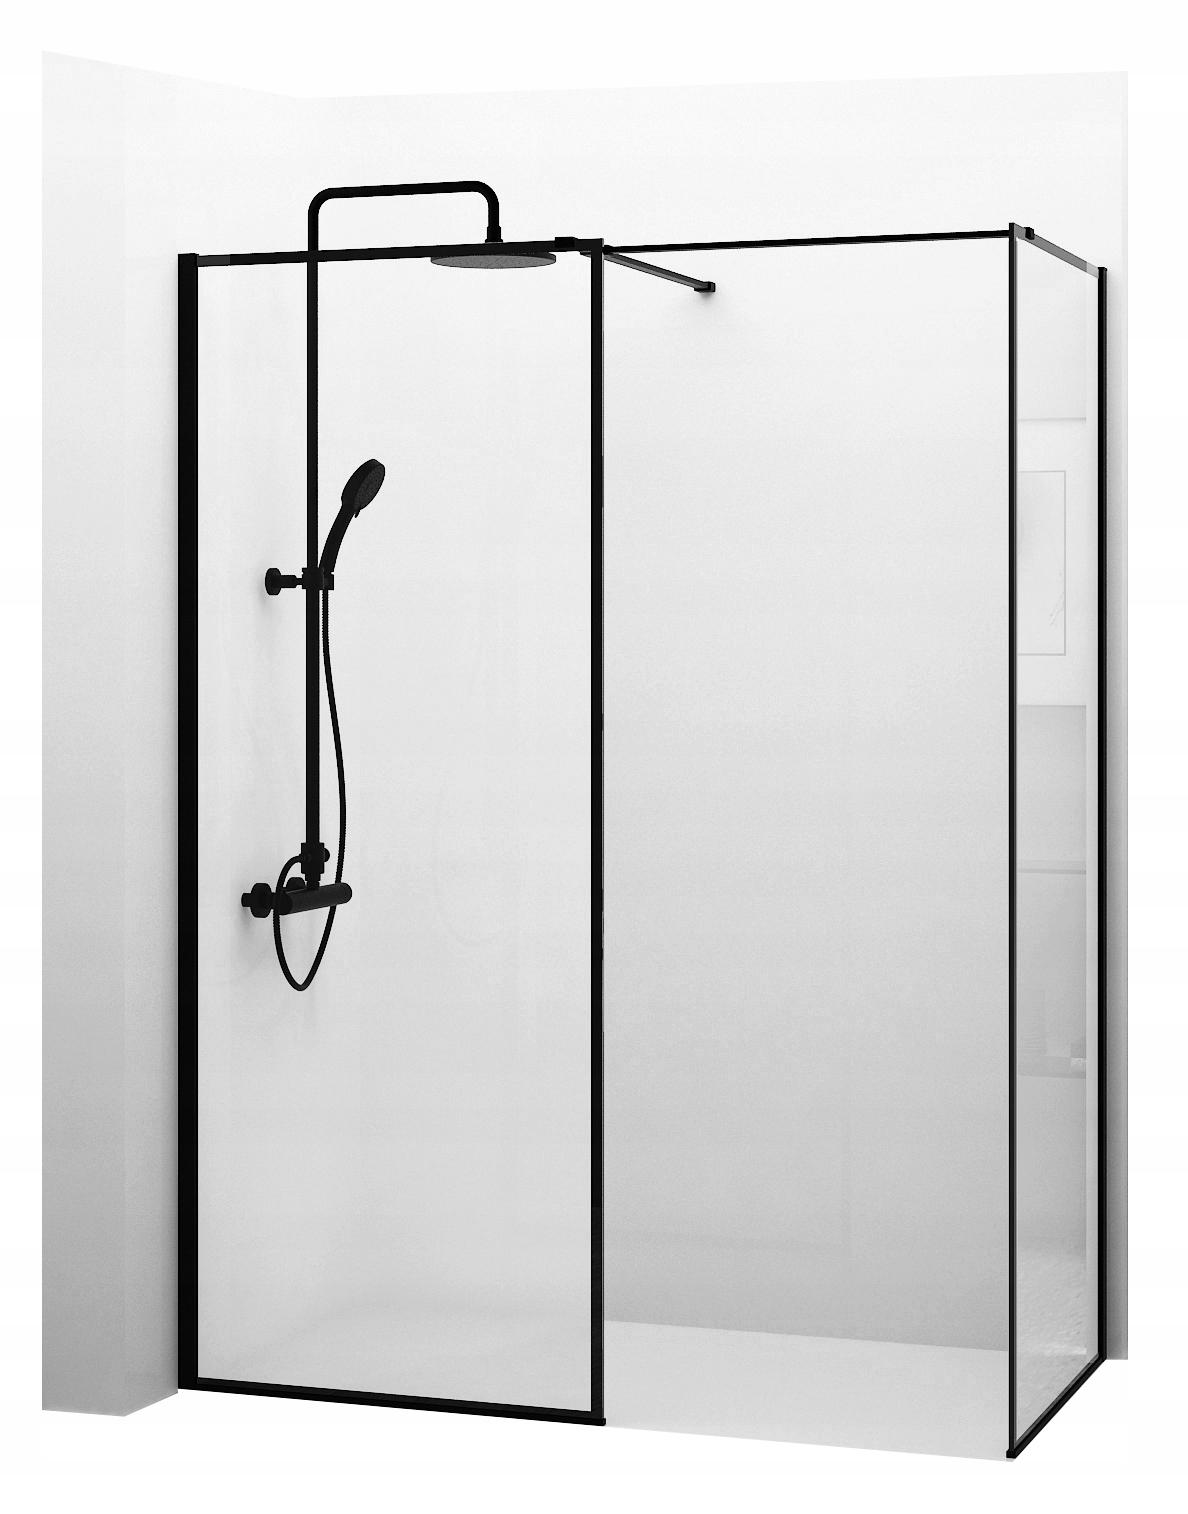 Sprchová kabína BLER 70-120 cm Easy Clean - REA